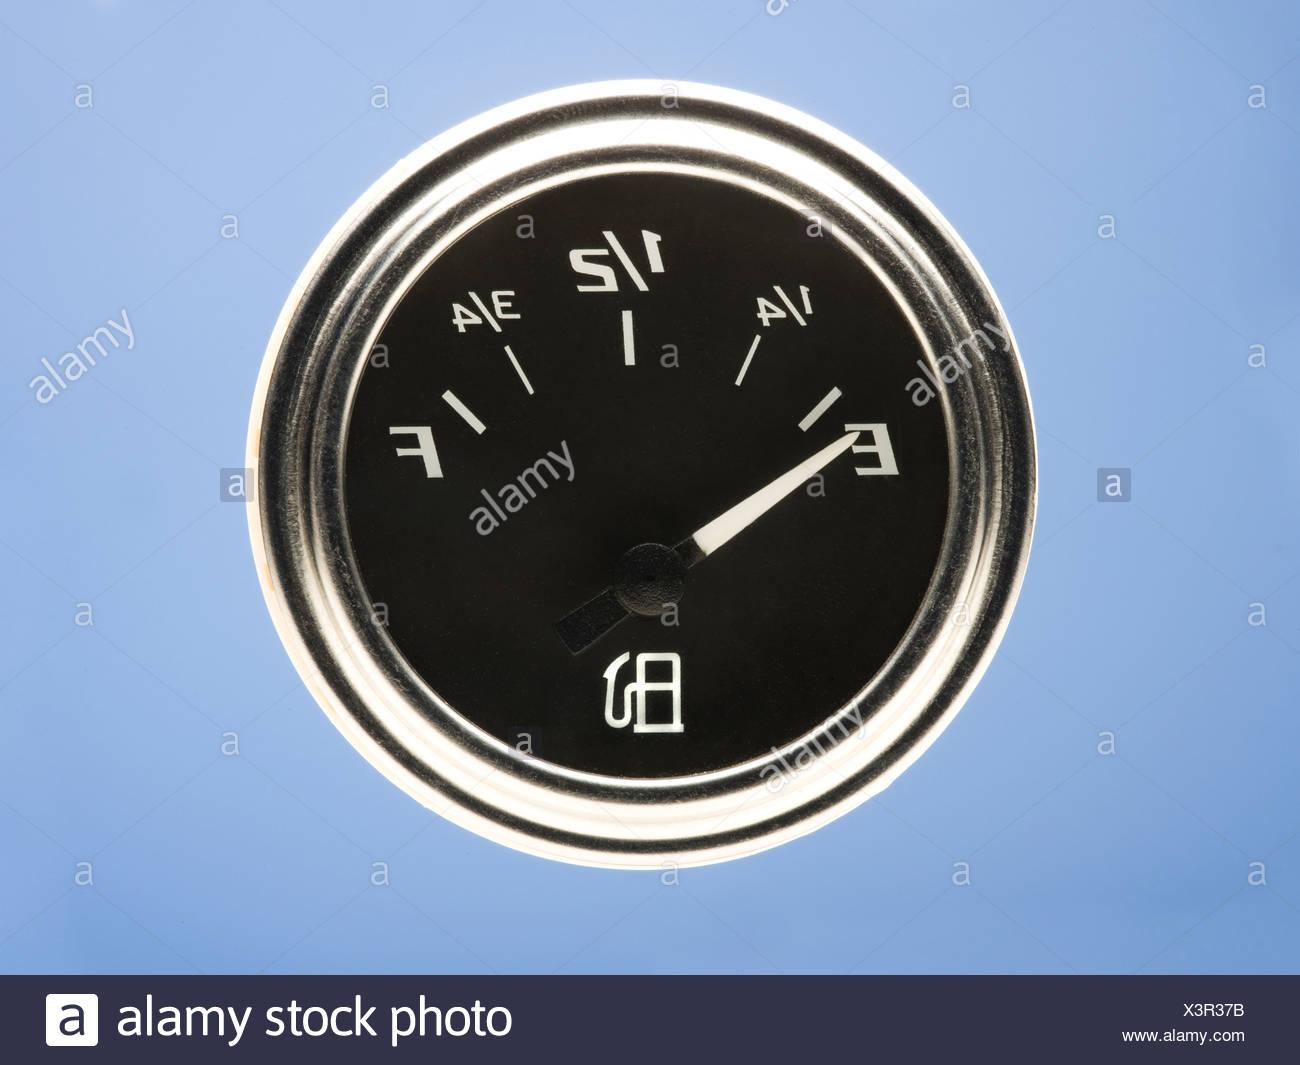 gas guage on empty - Stock Image